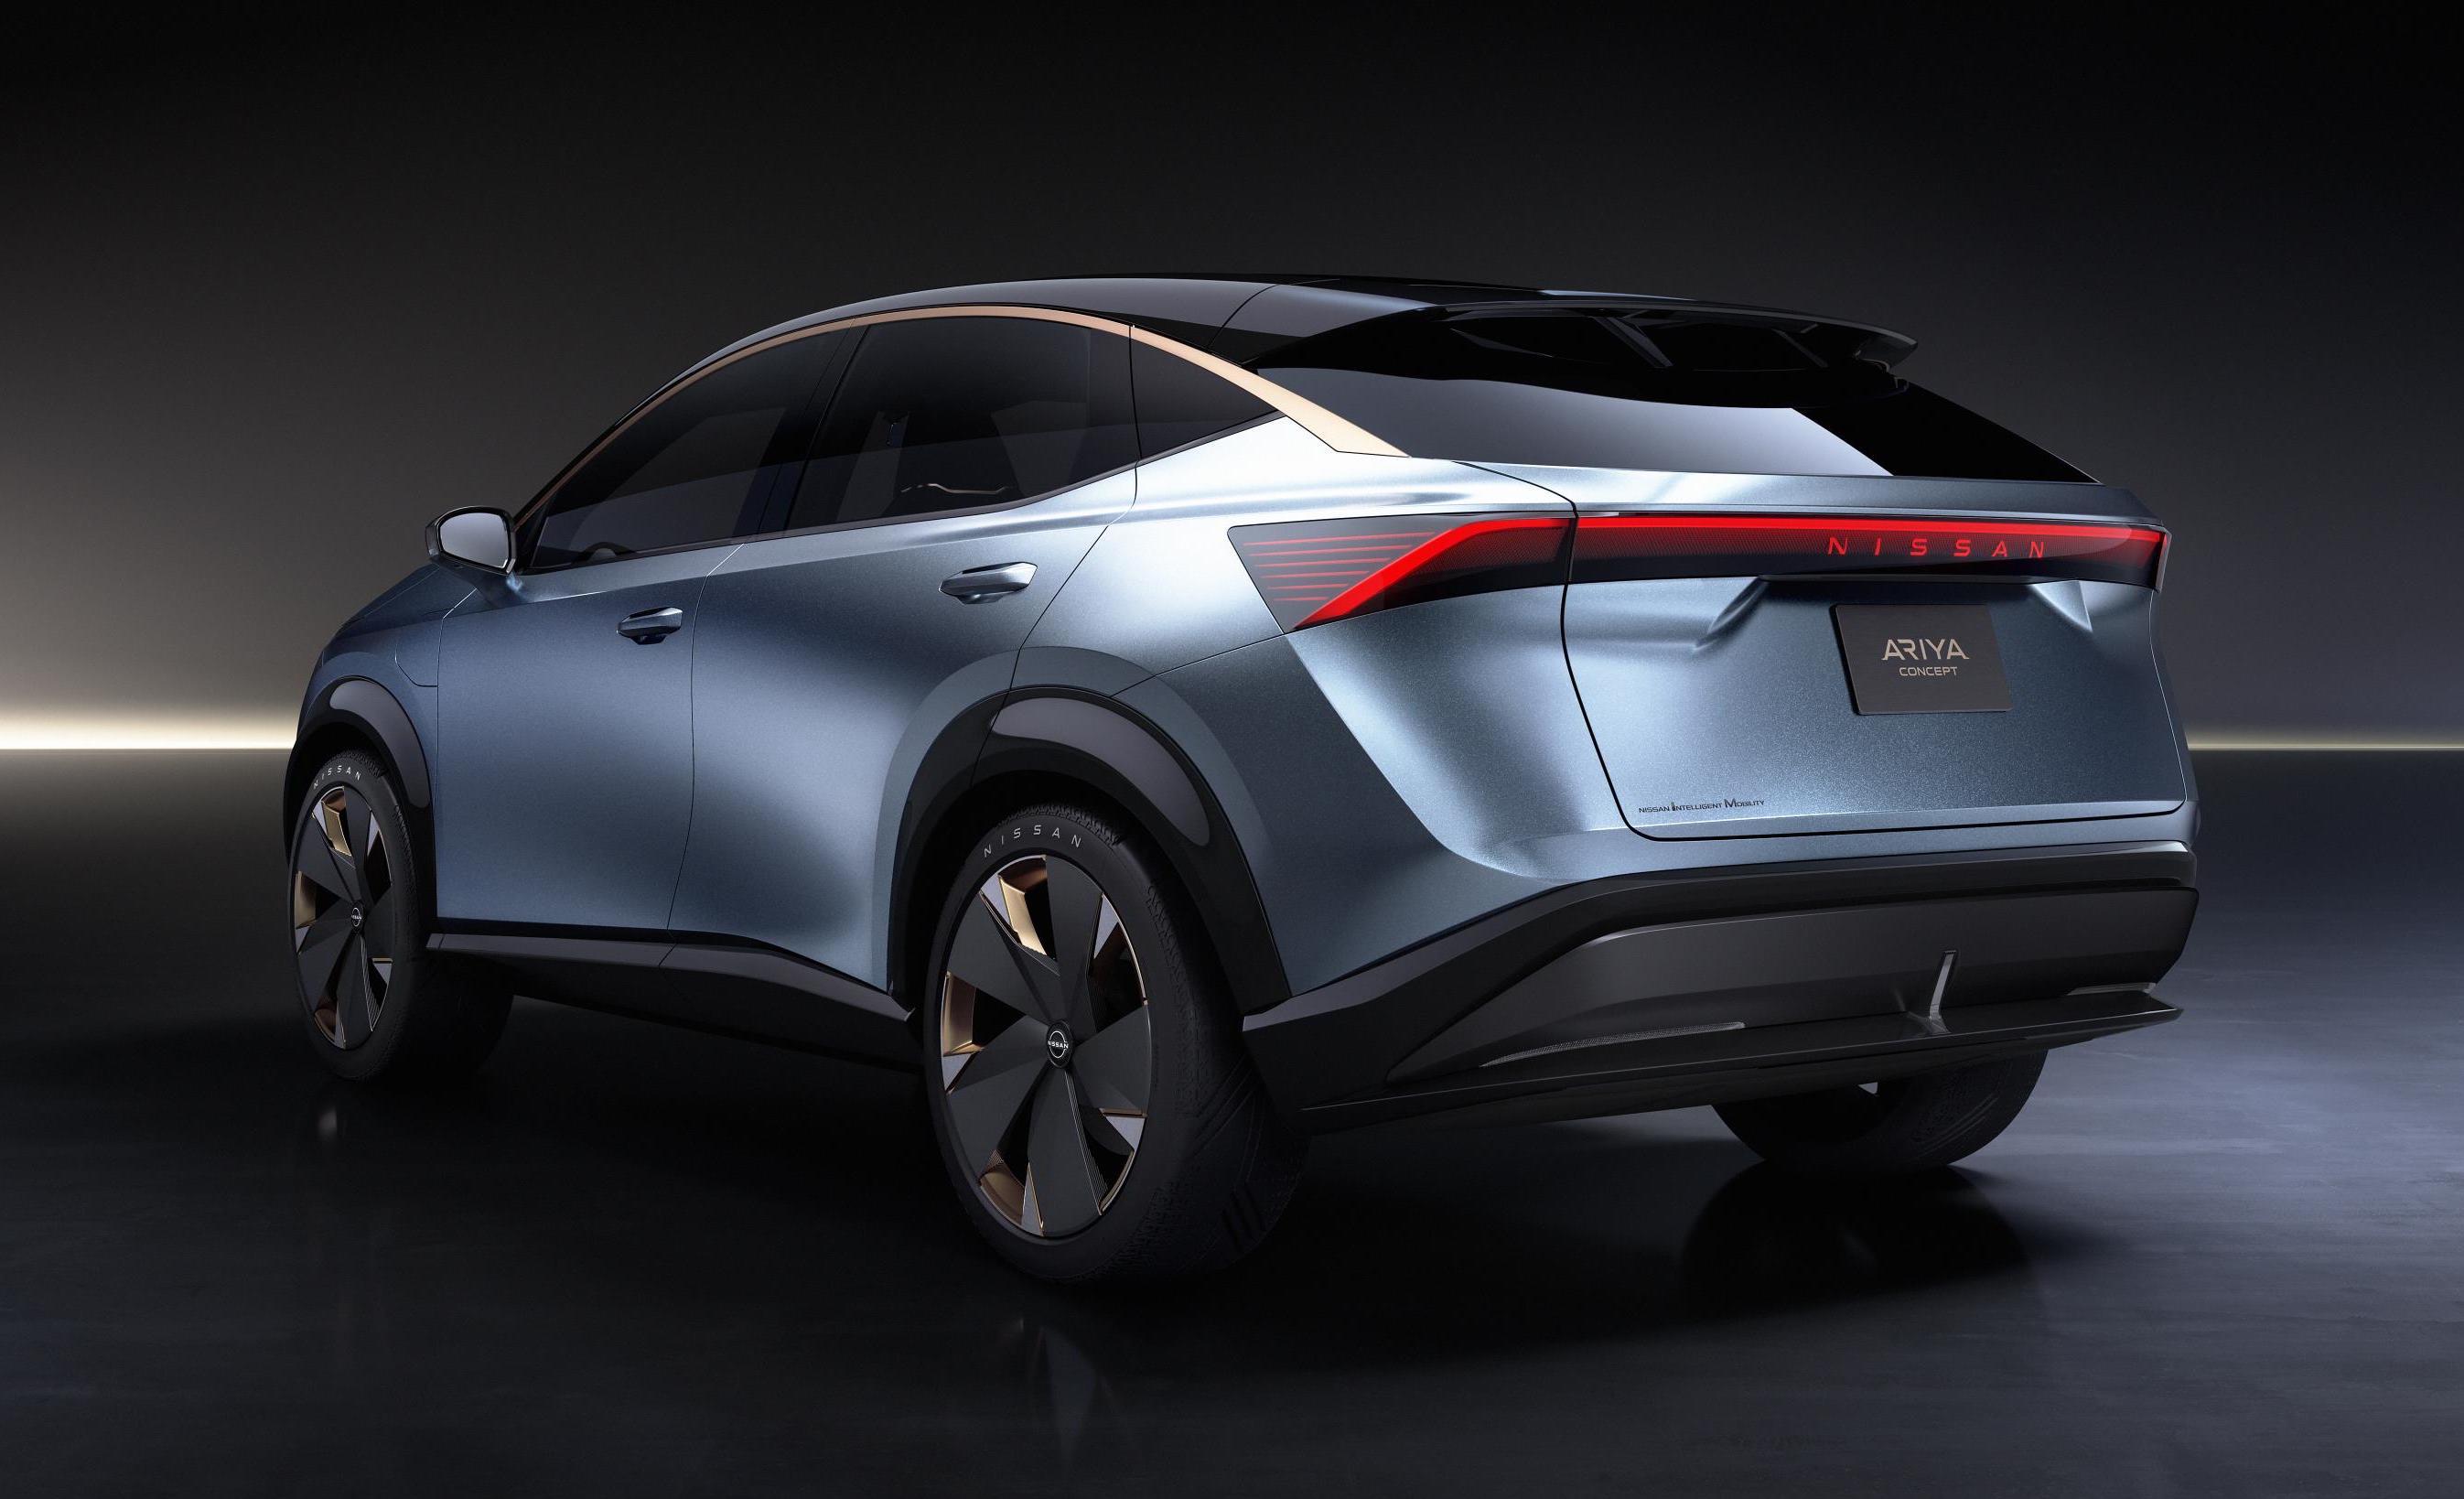 Nissan Ariya Electric Suv Concept Revealed At Tokyo Show Performancedrive